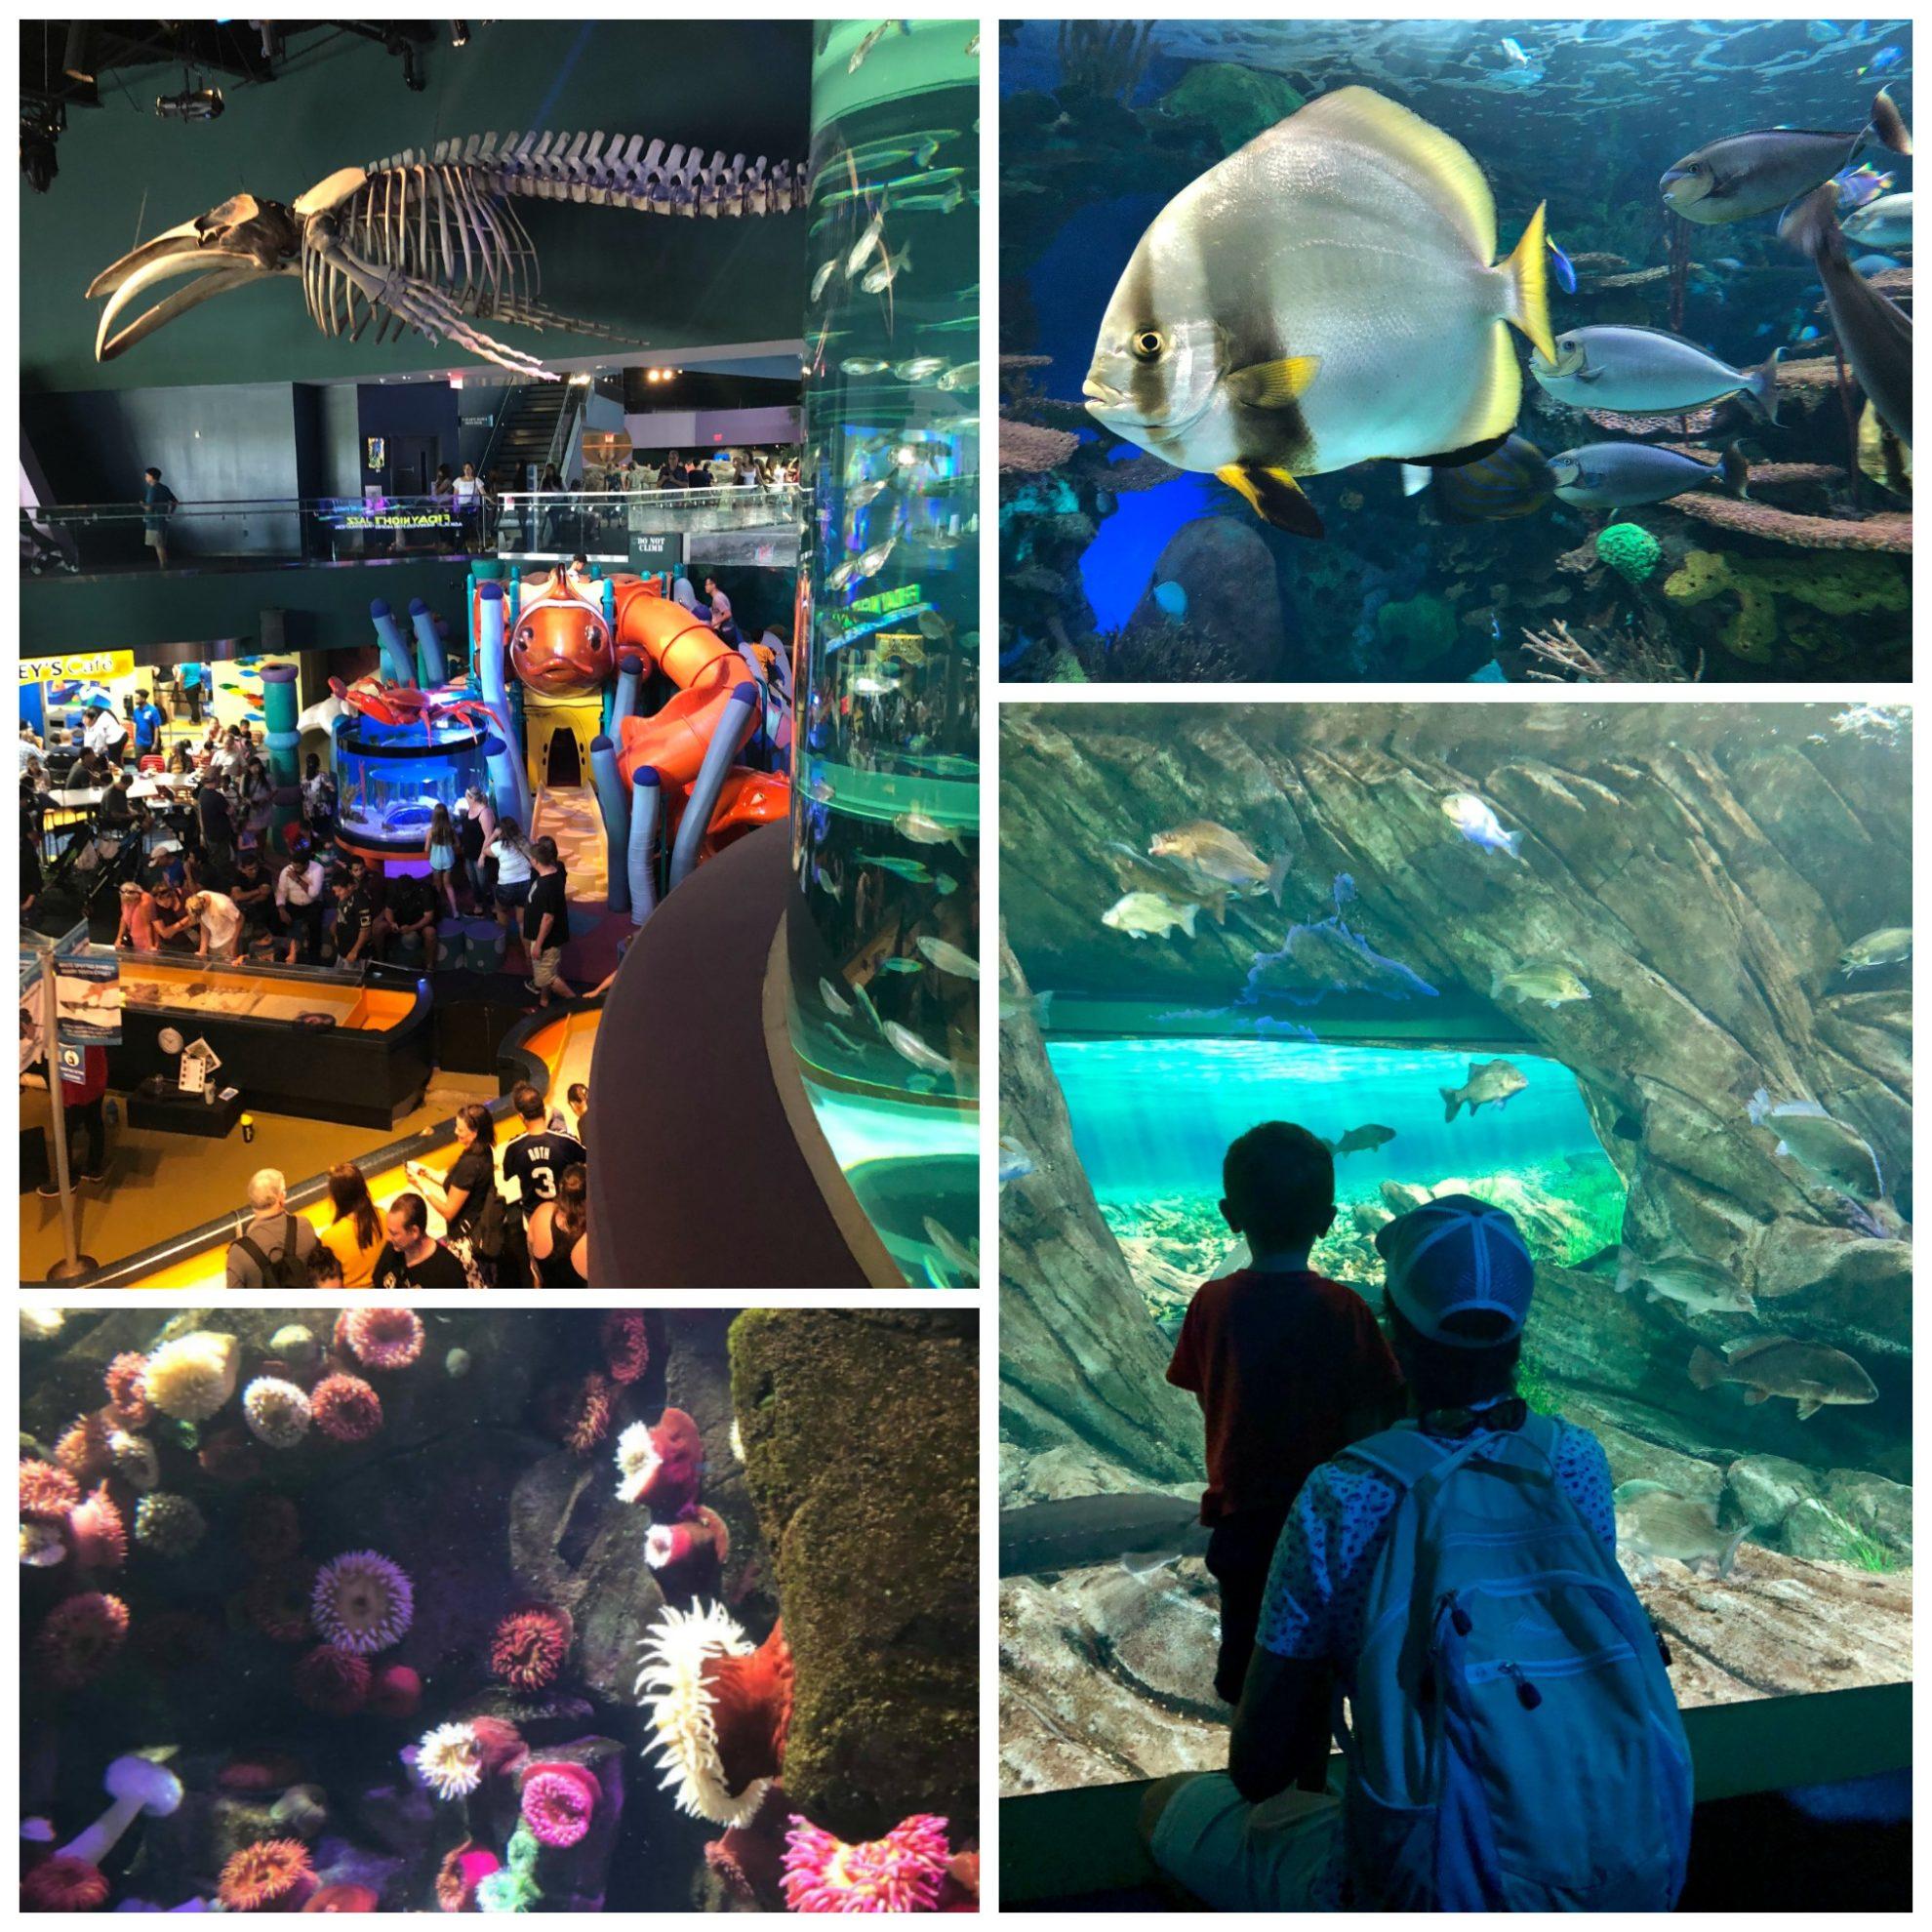 Ripleys Aquarium of Canada Kid's Play Area and Tanks